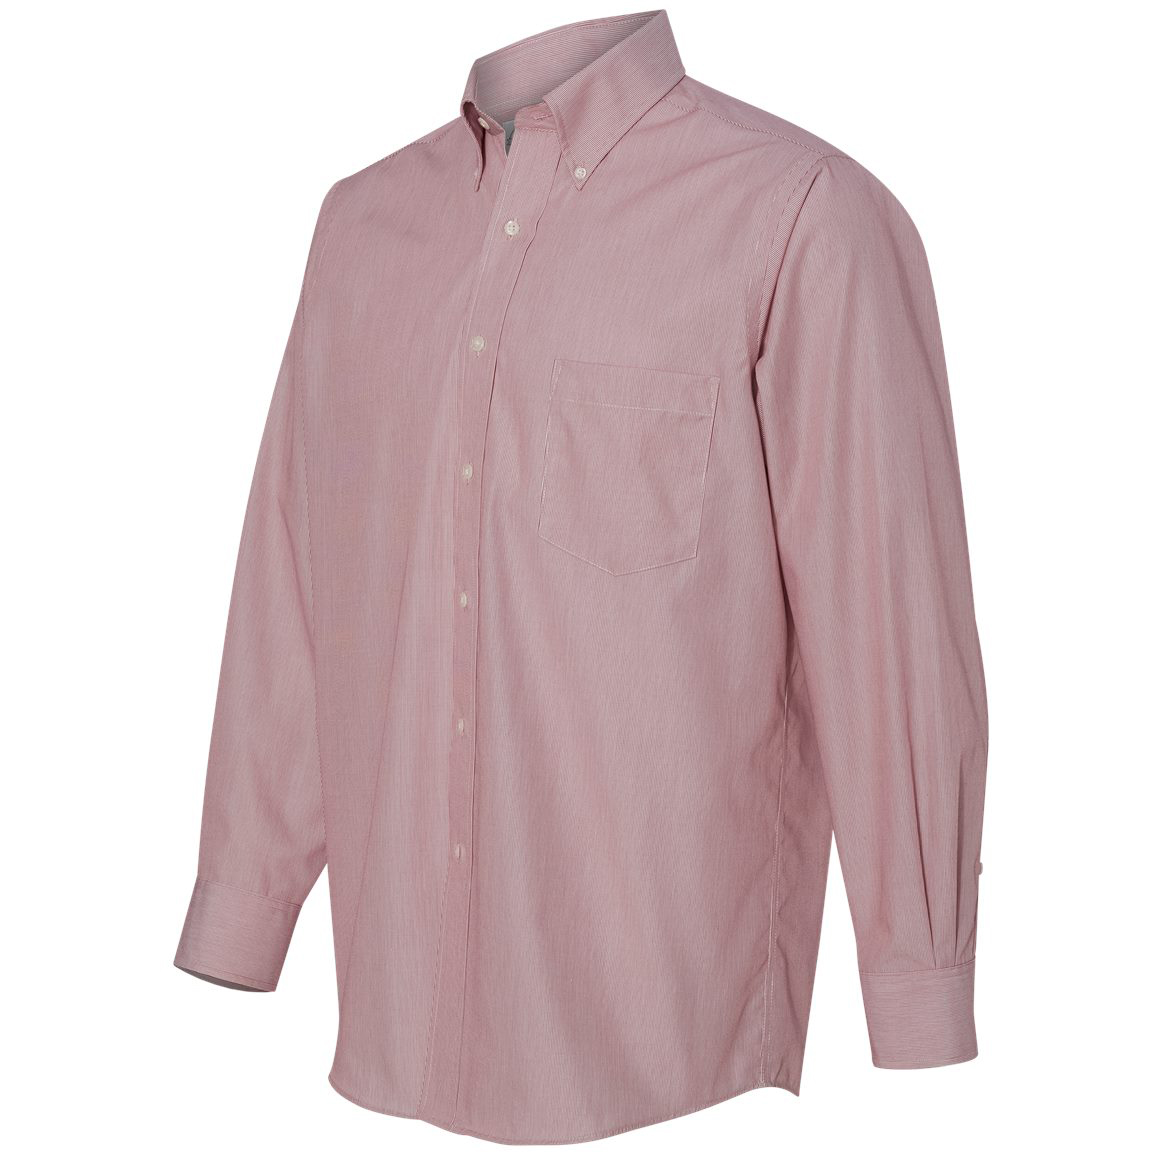 Van heusen 13v0420 non iron featherstripe shirt red for Van heusen non iron shirts